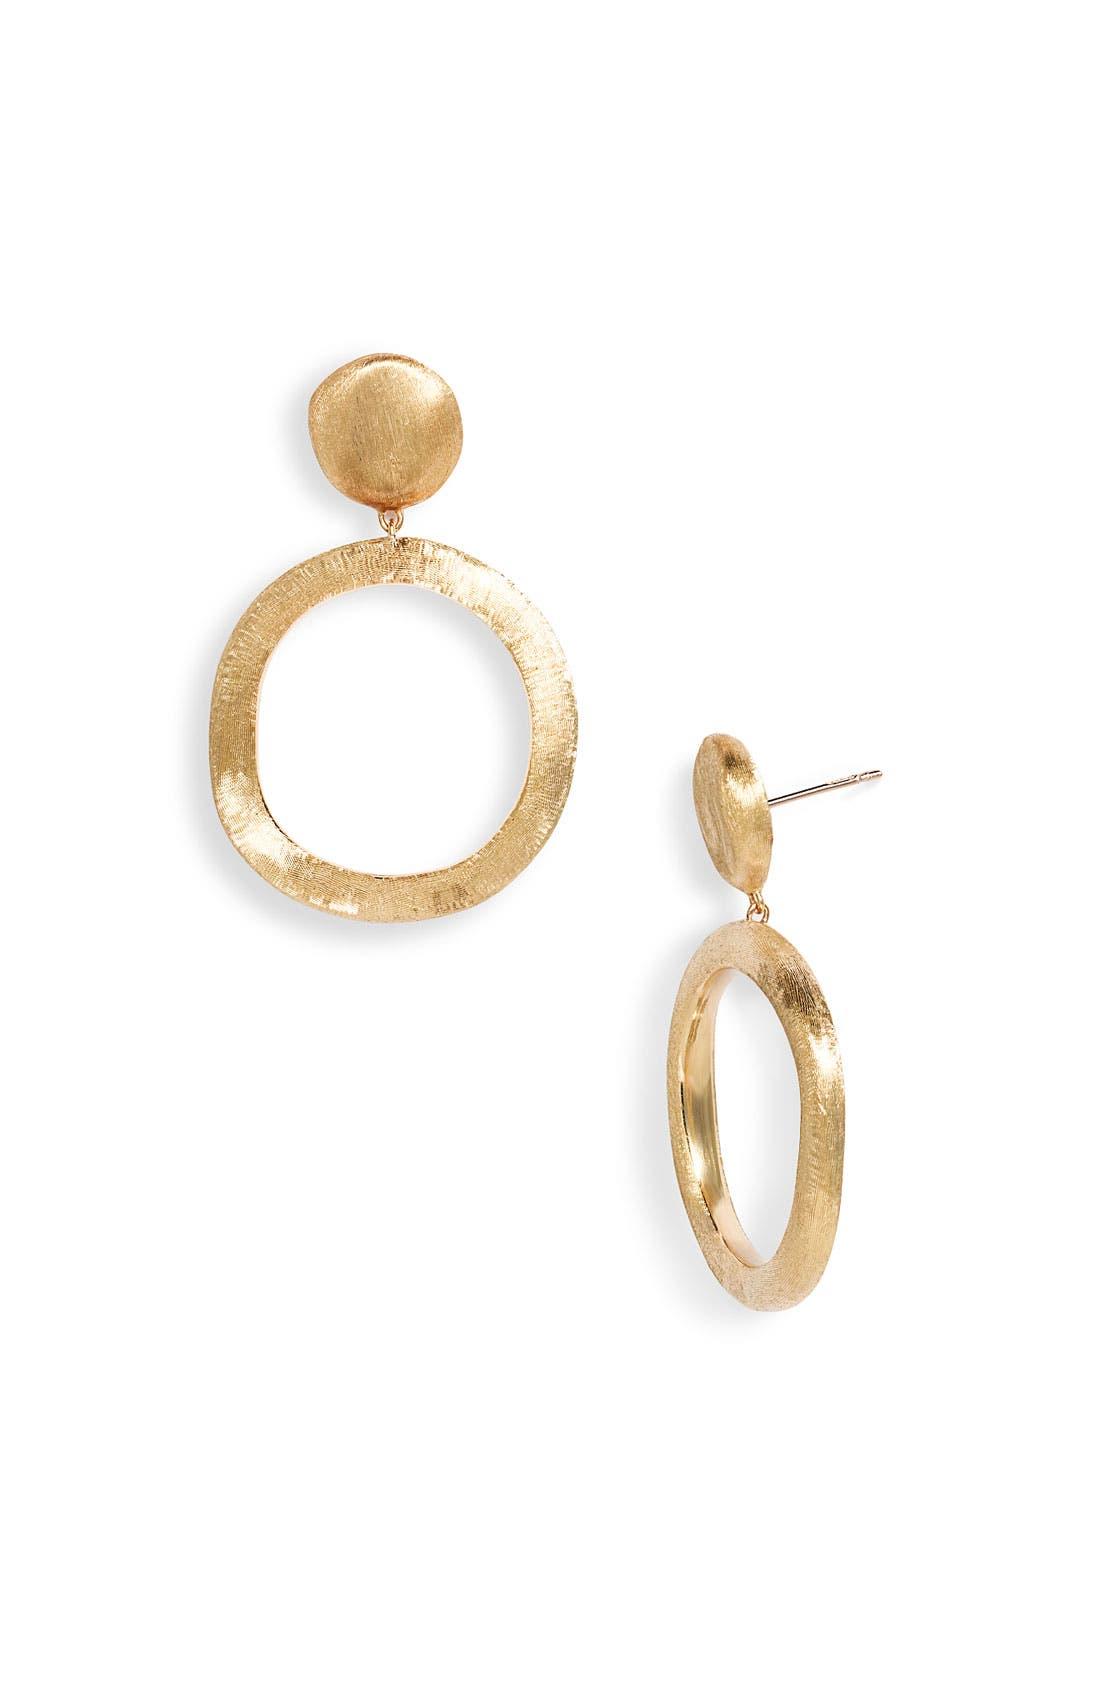 Alternate Image 1 Selected - Marco Bicego 'Jaipur' Large Drop Earrings